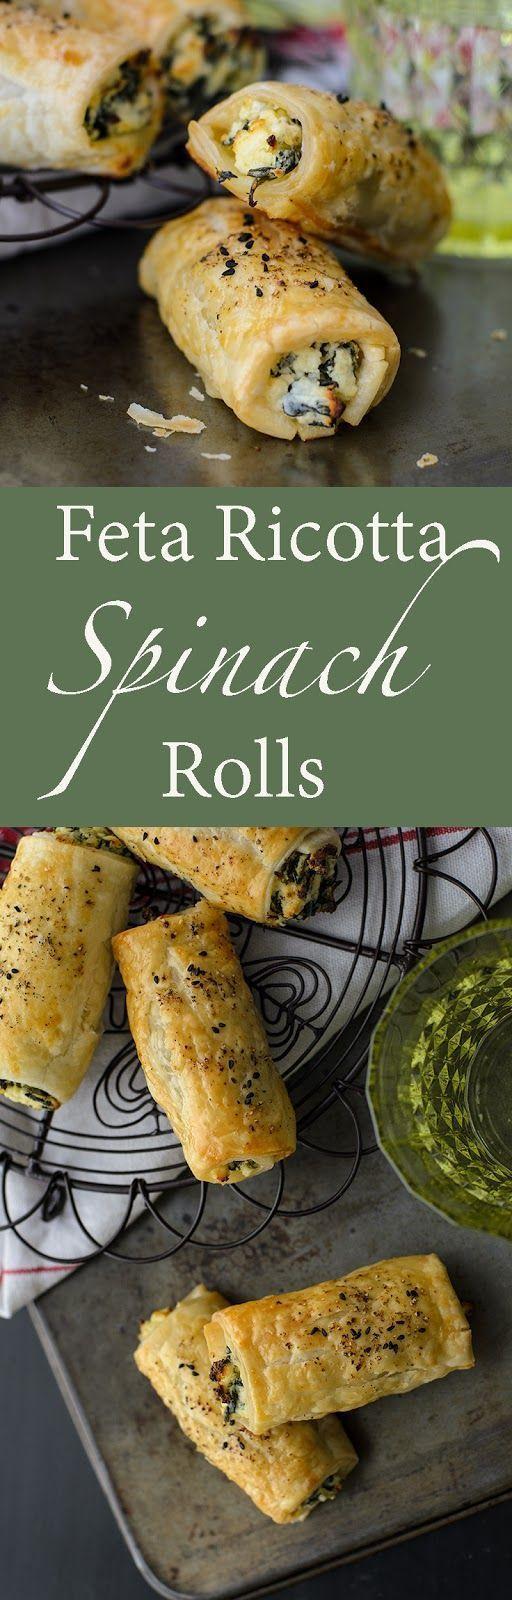 Feta Ricotta Spinach Rolls[EXTRACT]Feta Ricotta Spinach Rolls